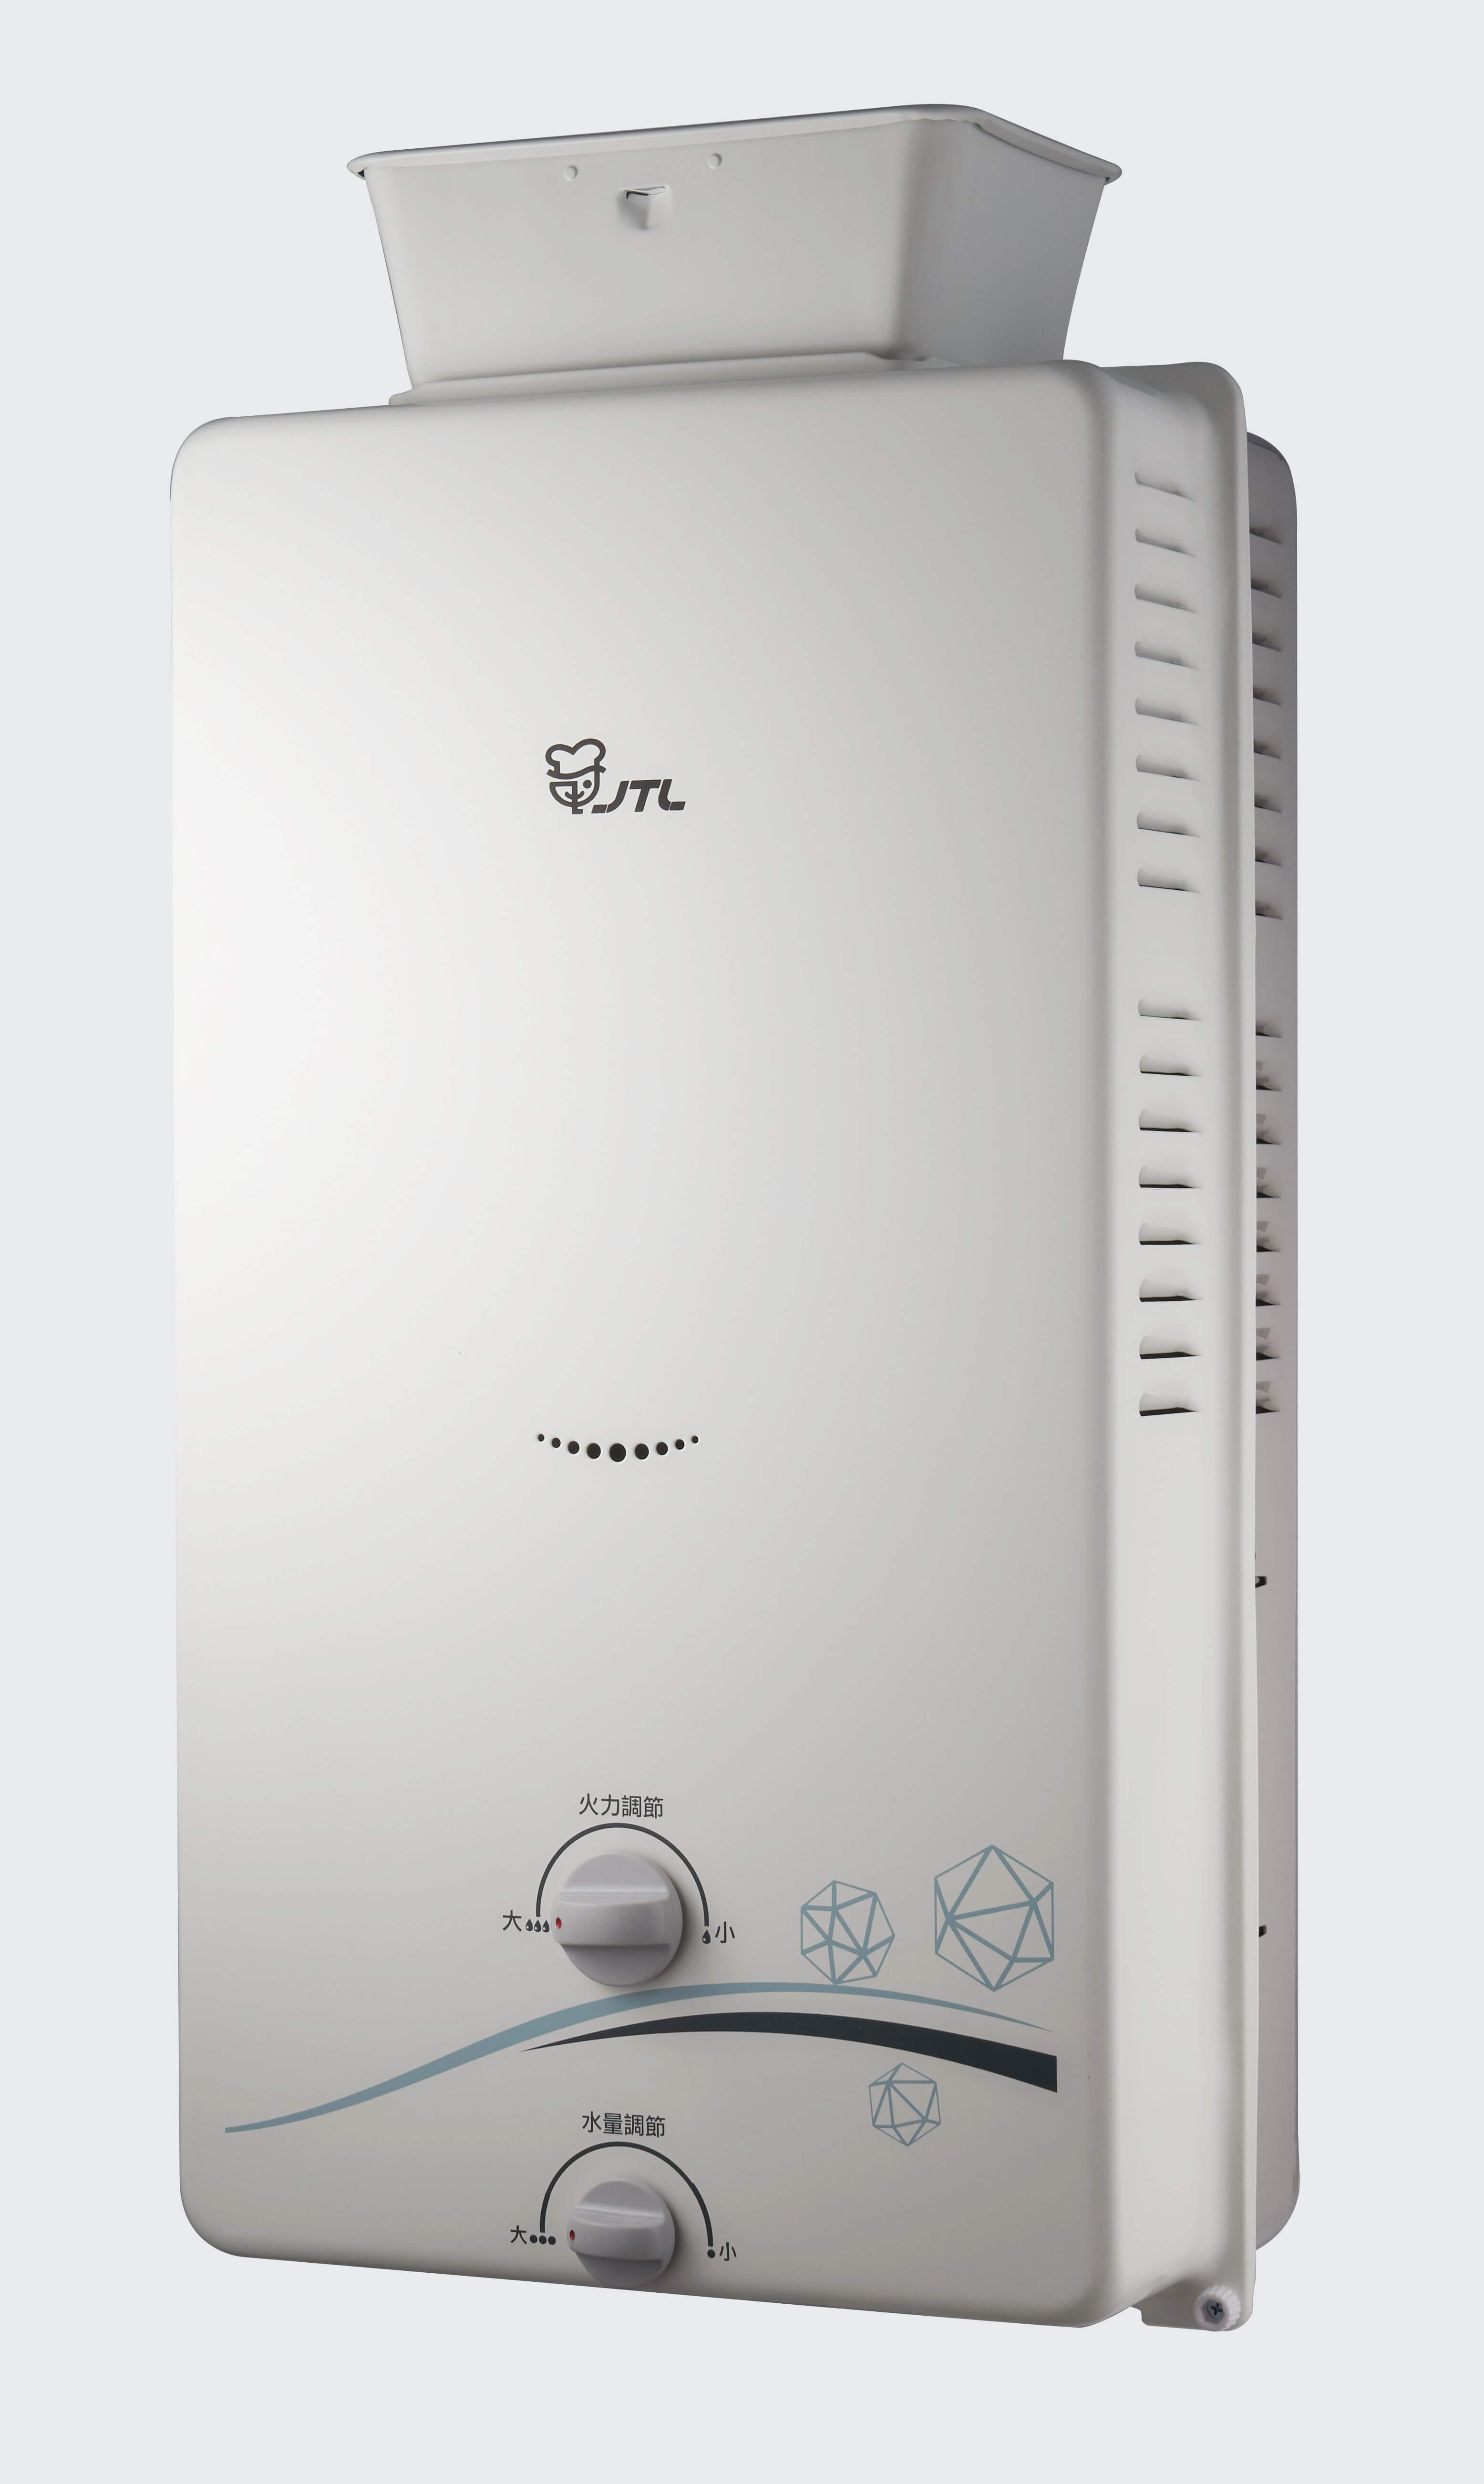 JT-H1216 屋外RF式熱水器(12L)-JT-H1216